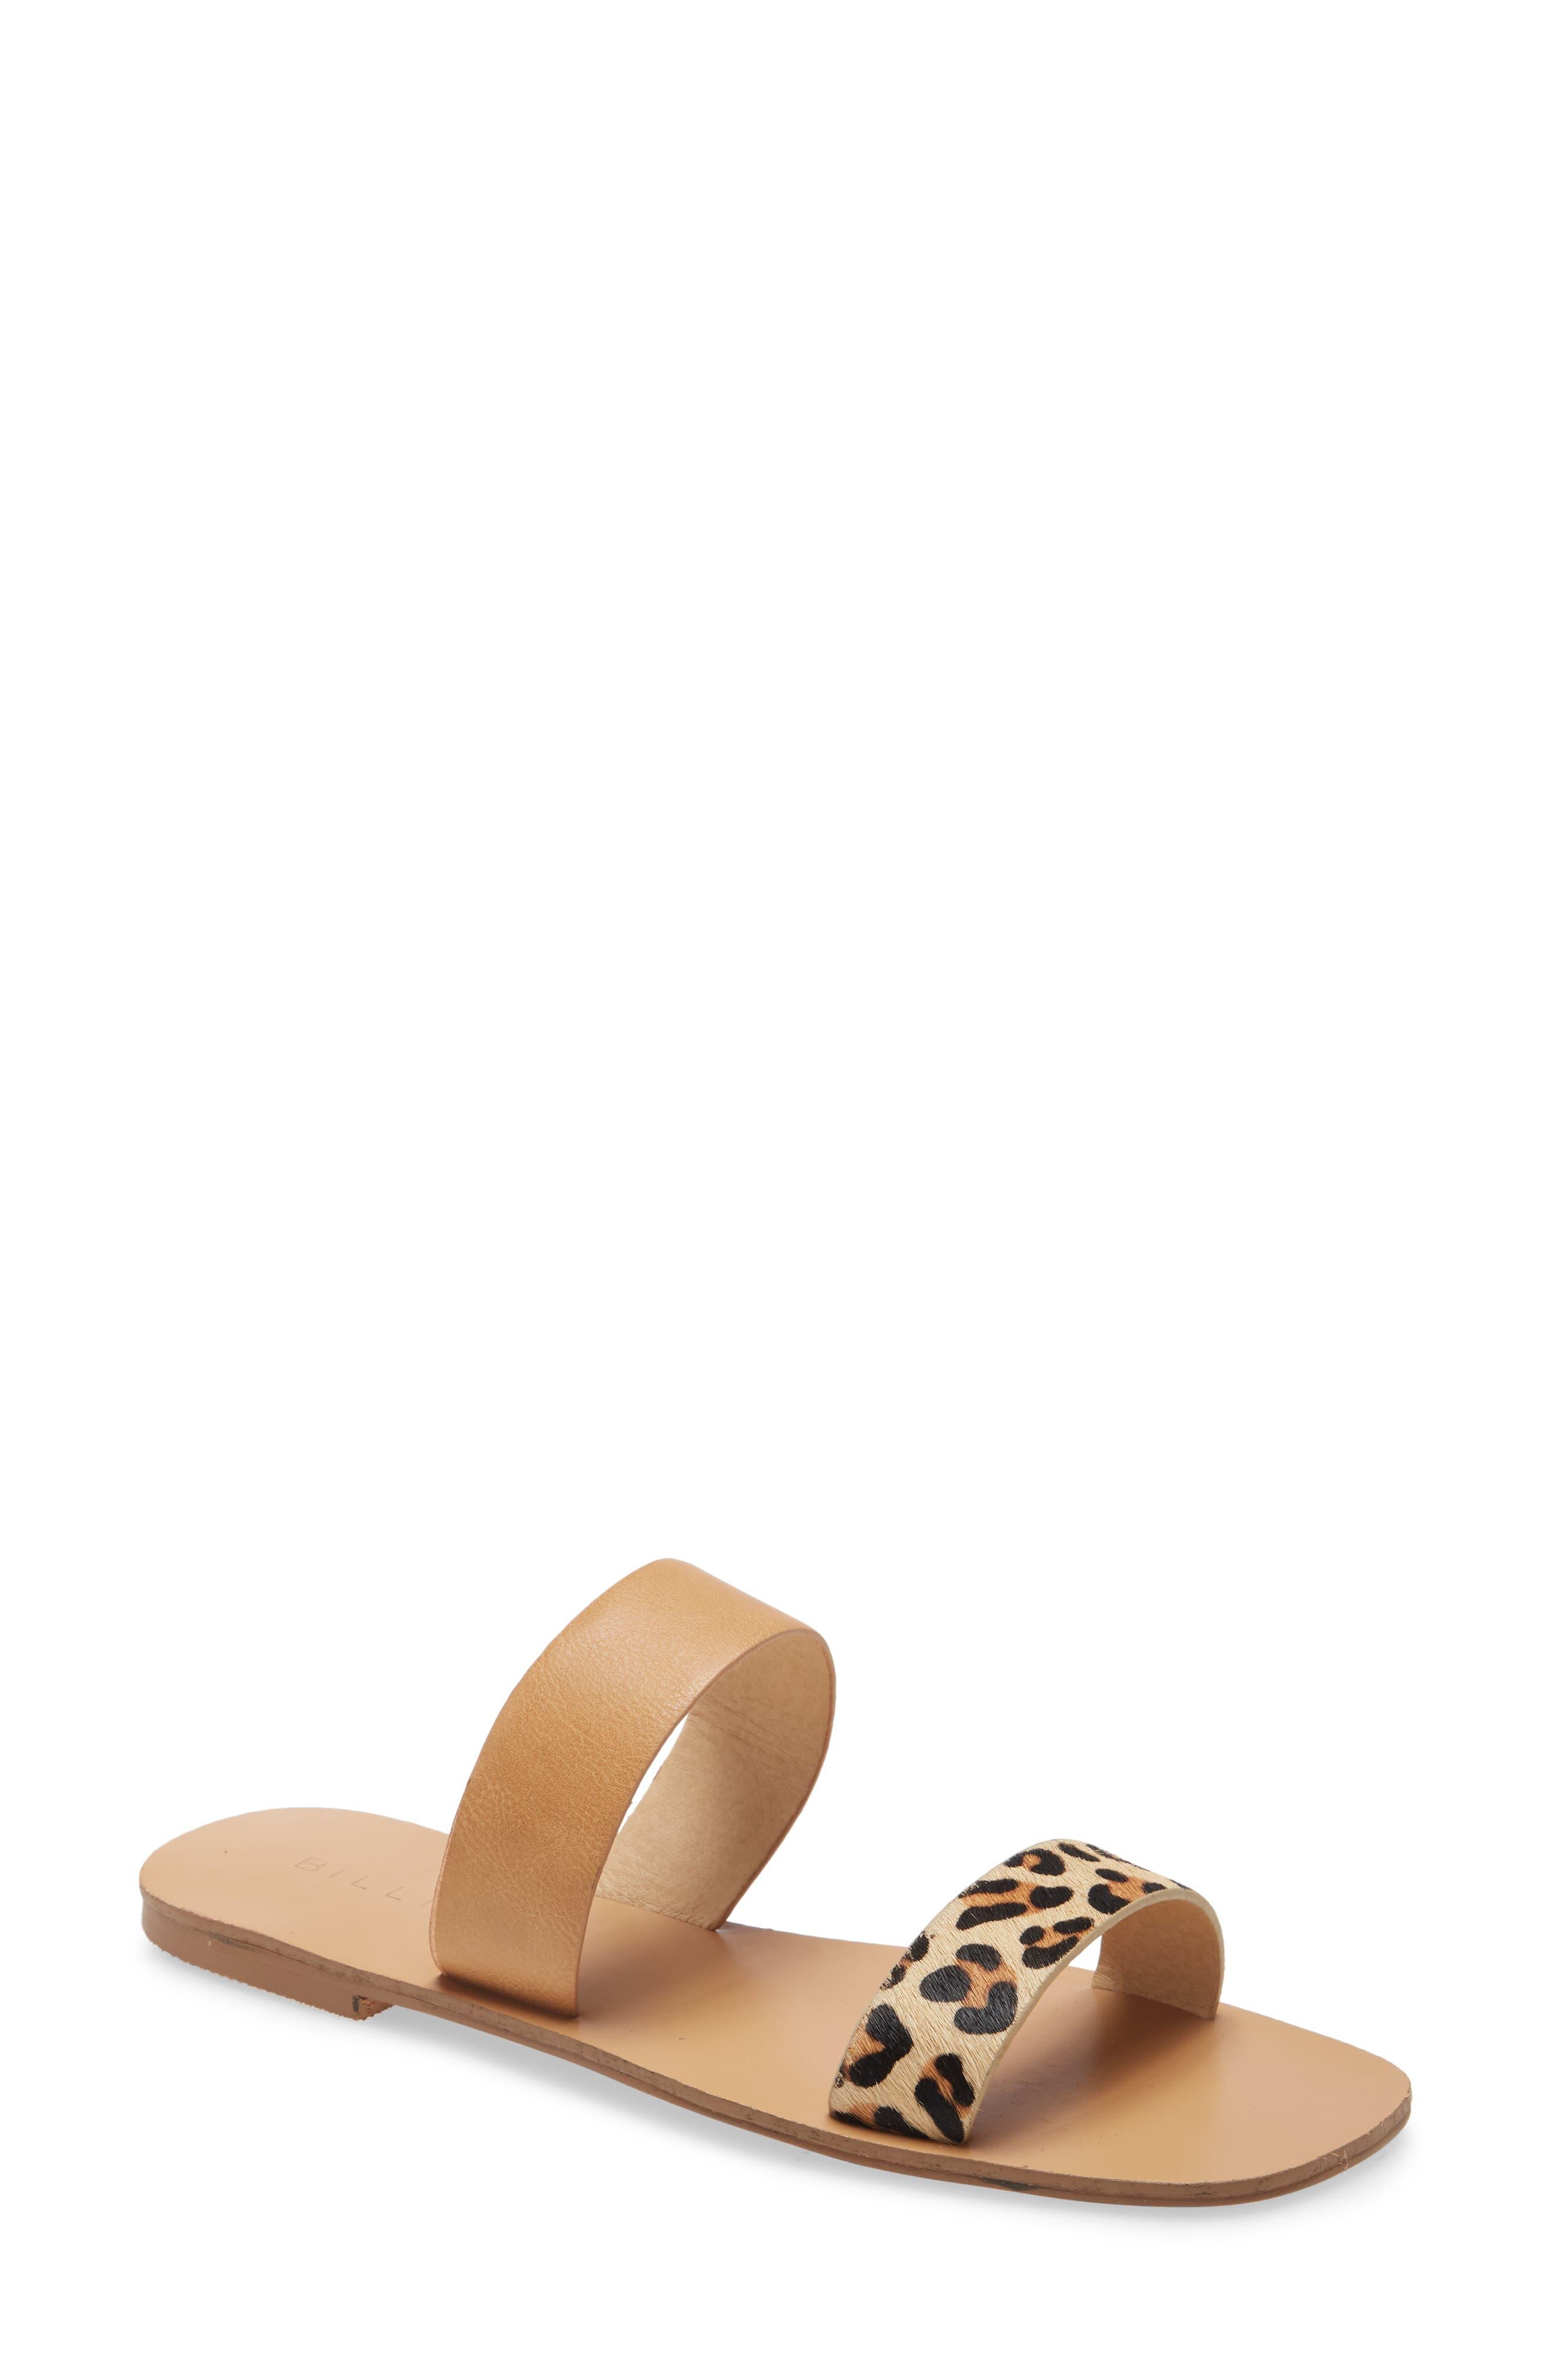 Tate Slide Sandal With Genuine Calf Hair